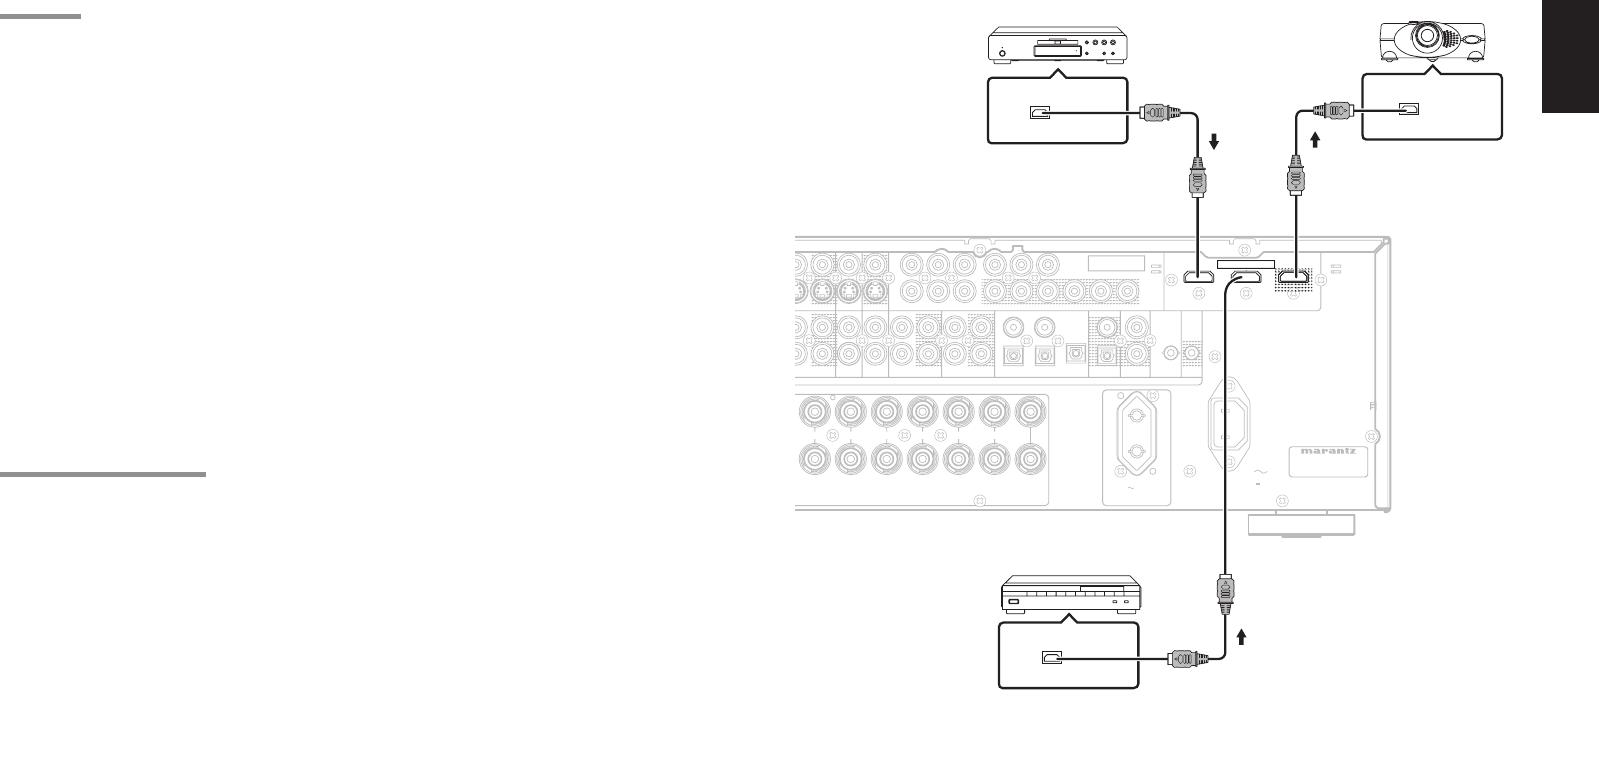 Marantz SR5001 HDMI JACK, CONNECTING HDMI DEVICES